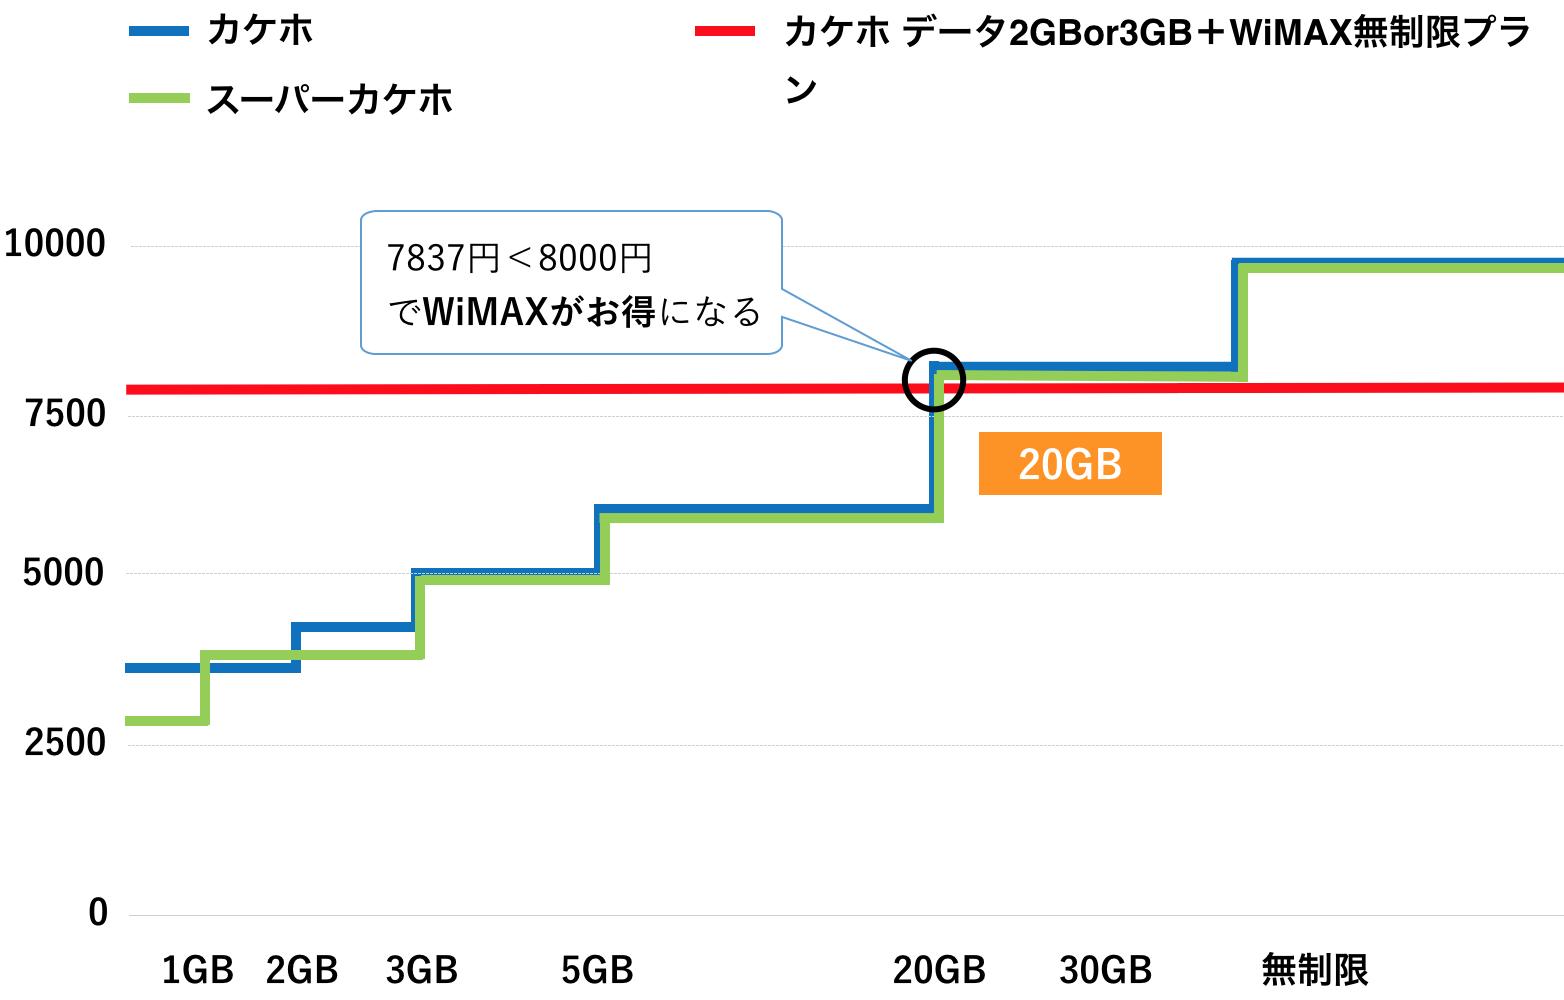 WiMAX スマホ au